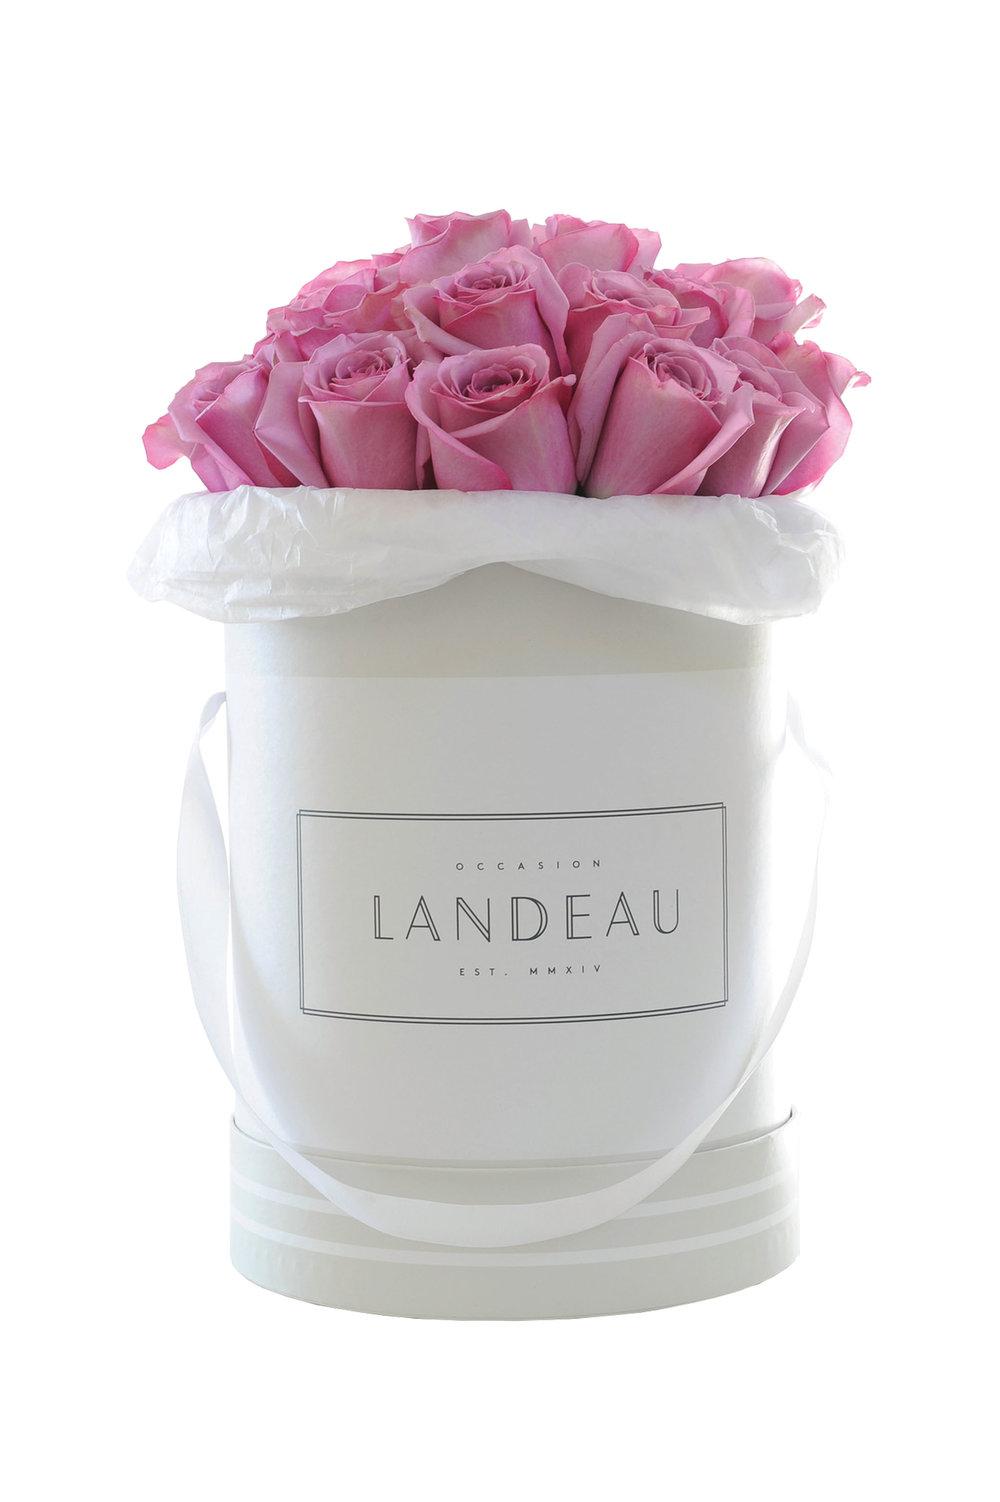 2.A Bouquet of 25 Fresh Ecuadorian Roses by Occasion Landeau $149, givelandeau.com